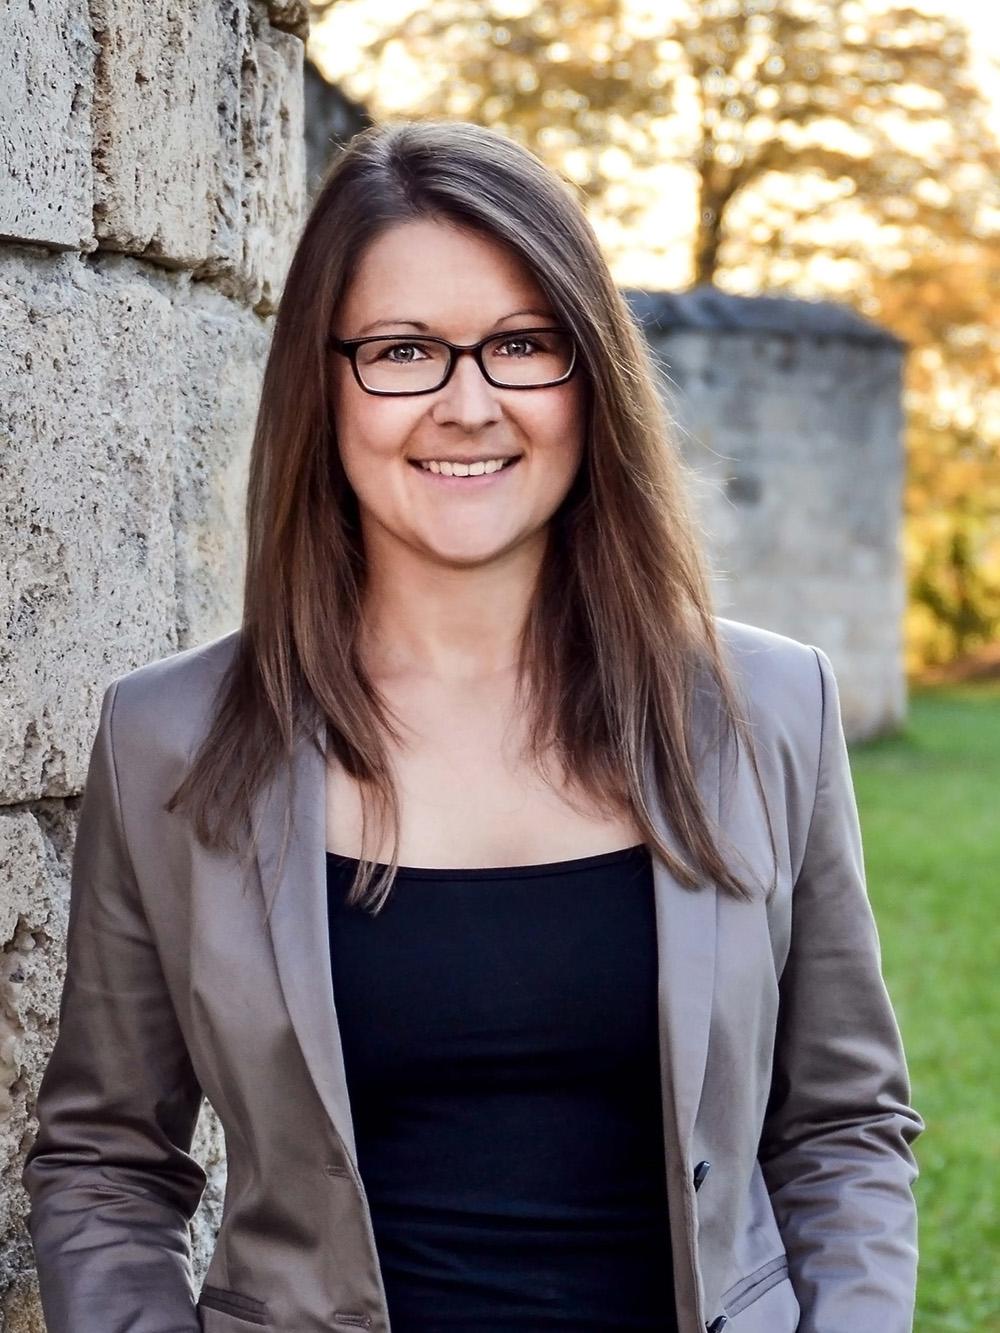 Katrin Bader-Schwaninger